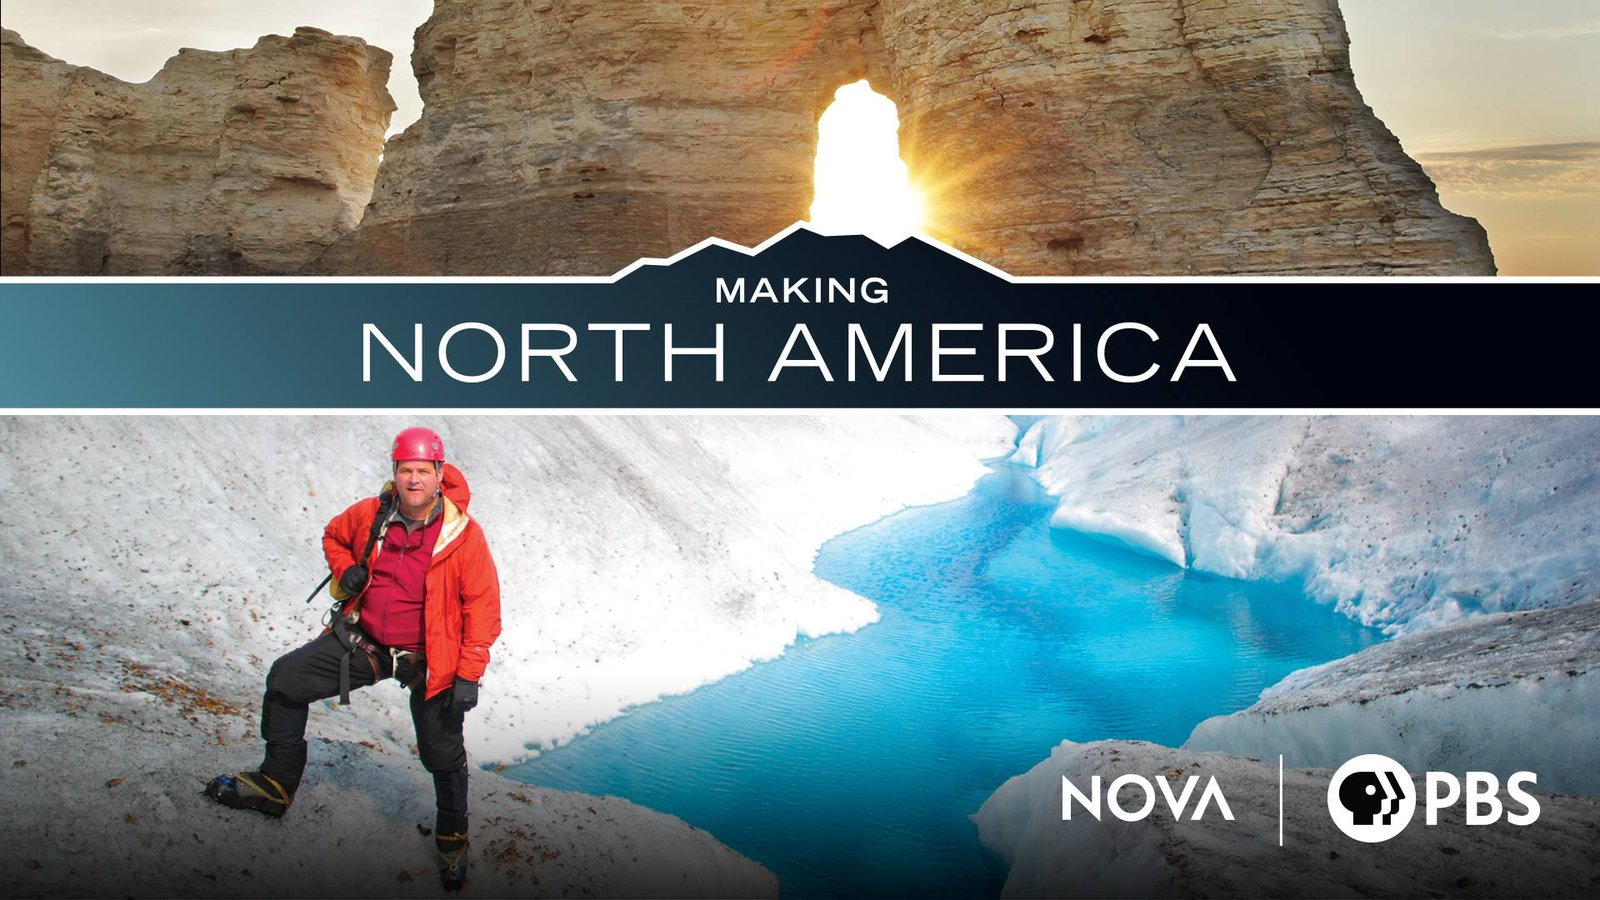 NOVA - Making North America